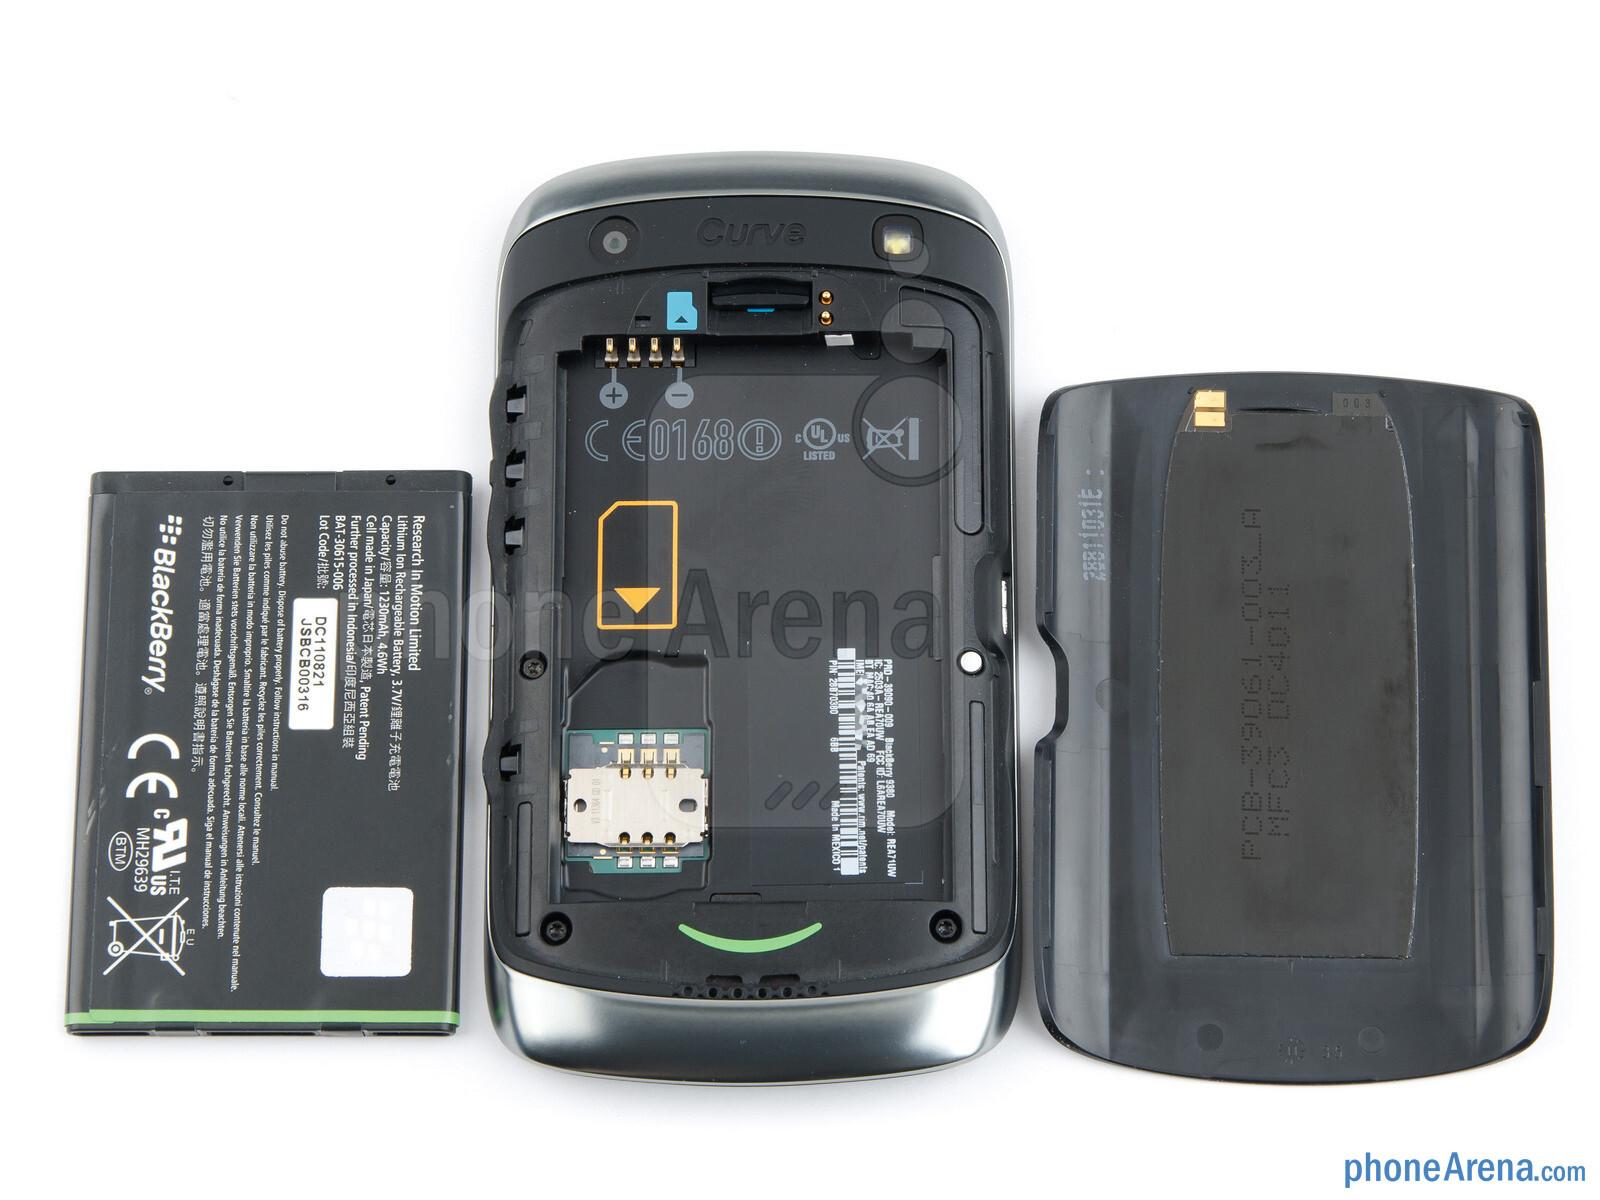 RIM BlackBerry Curve 9380 Review - PhoneArena